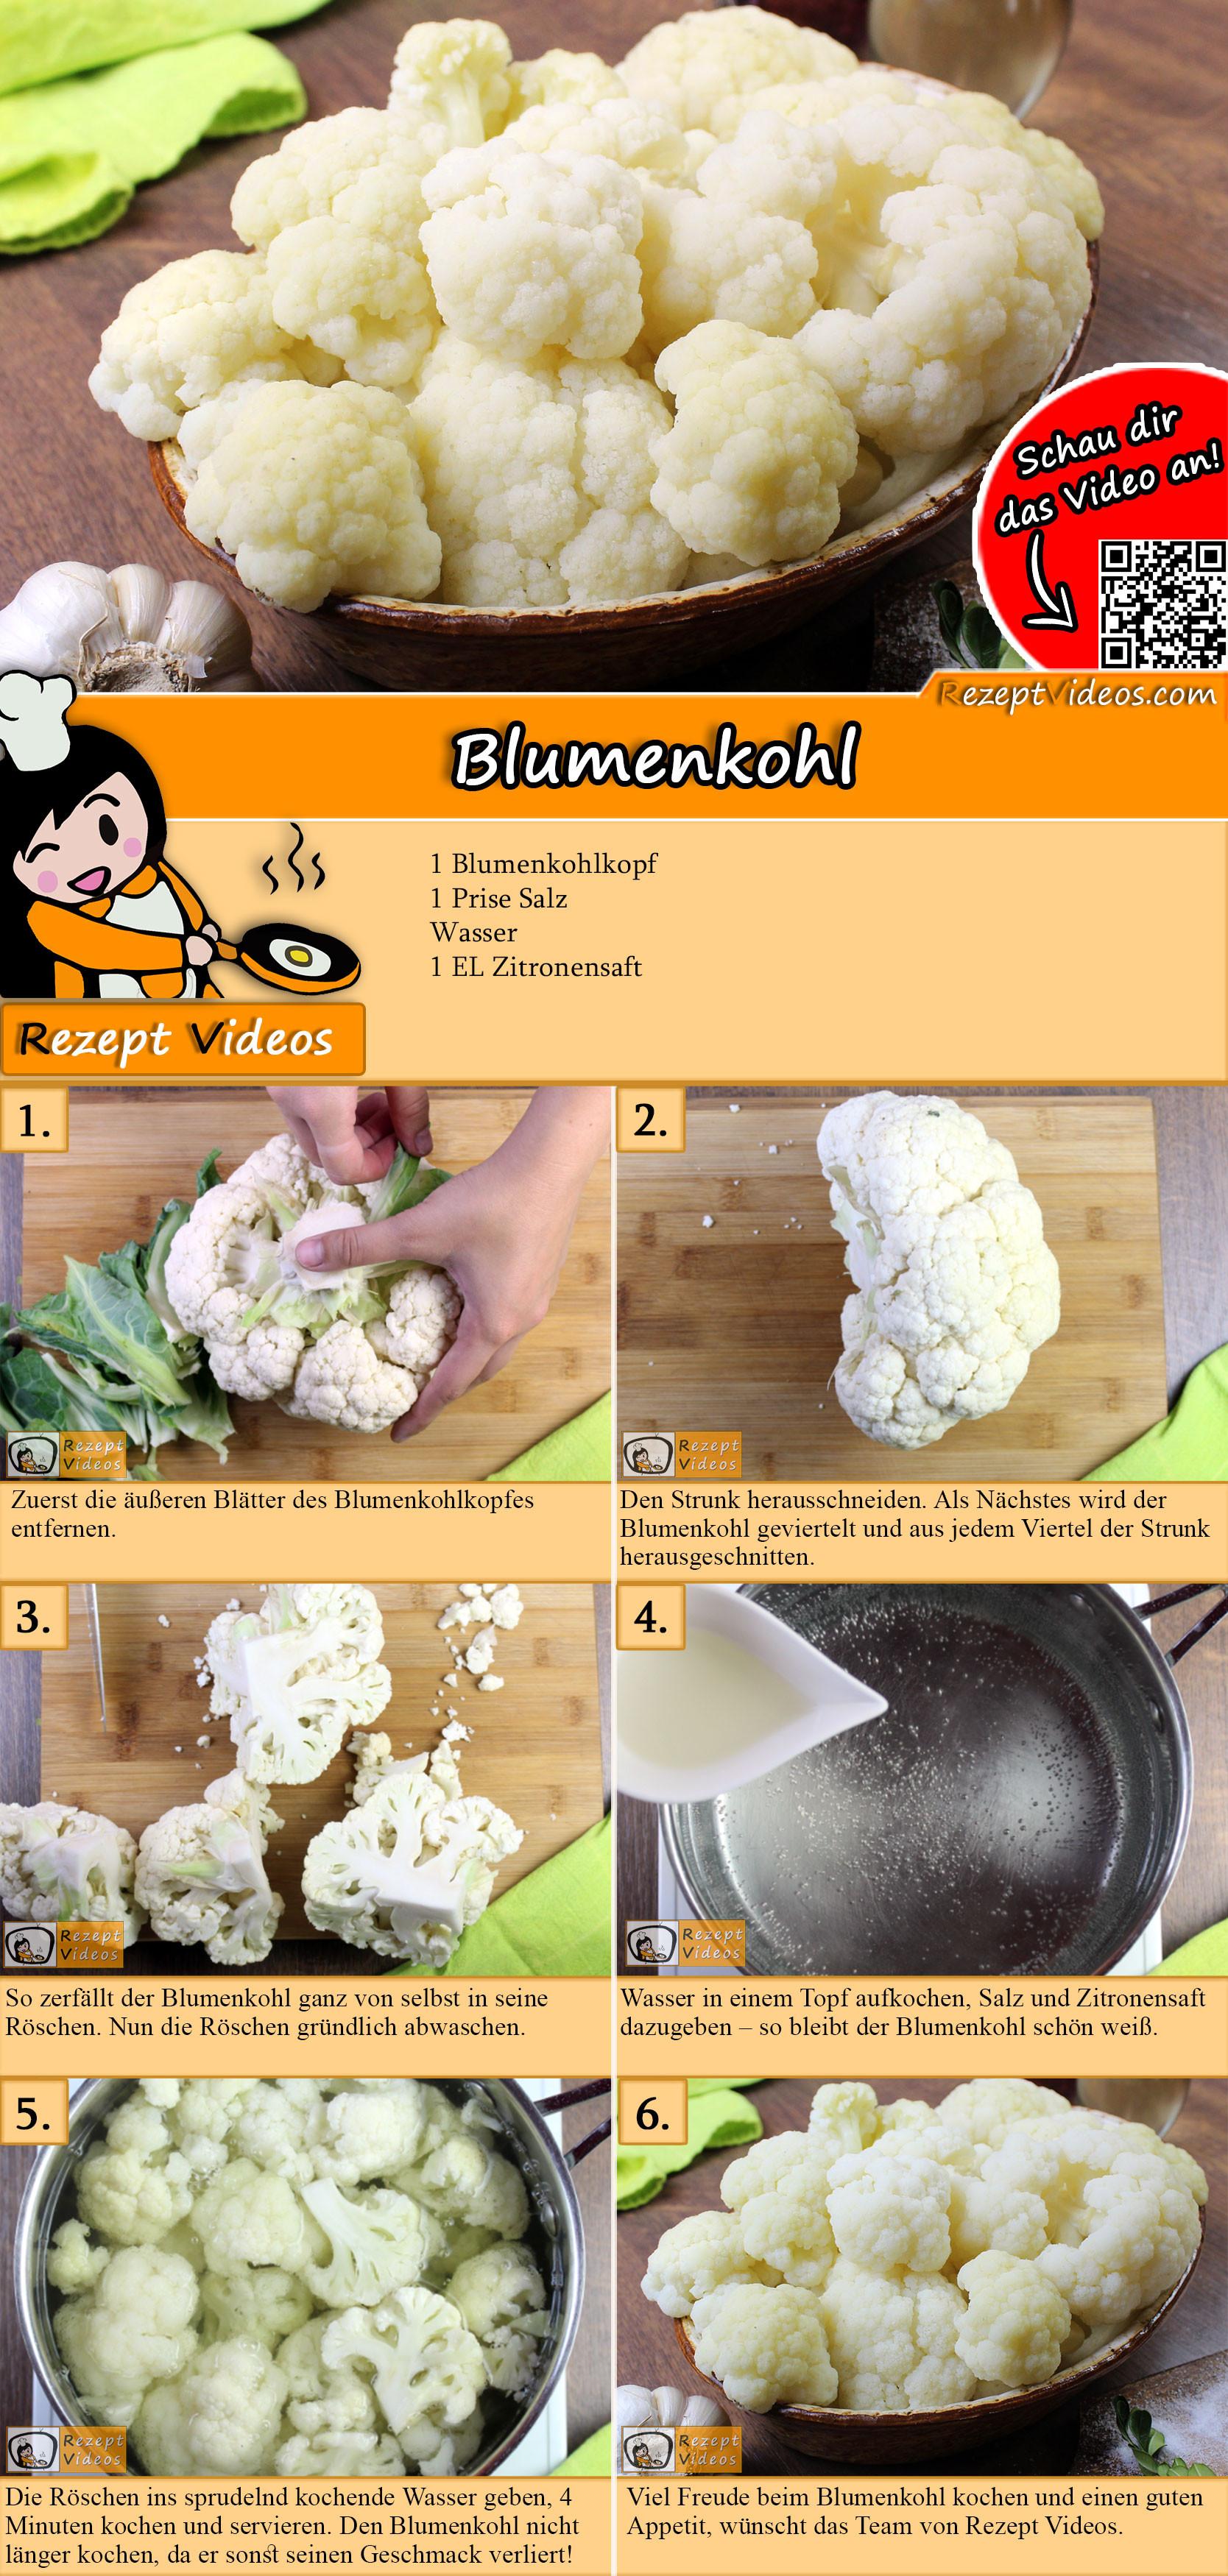 Blumenkohl Rezept mit Video